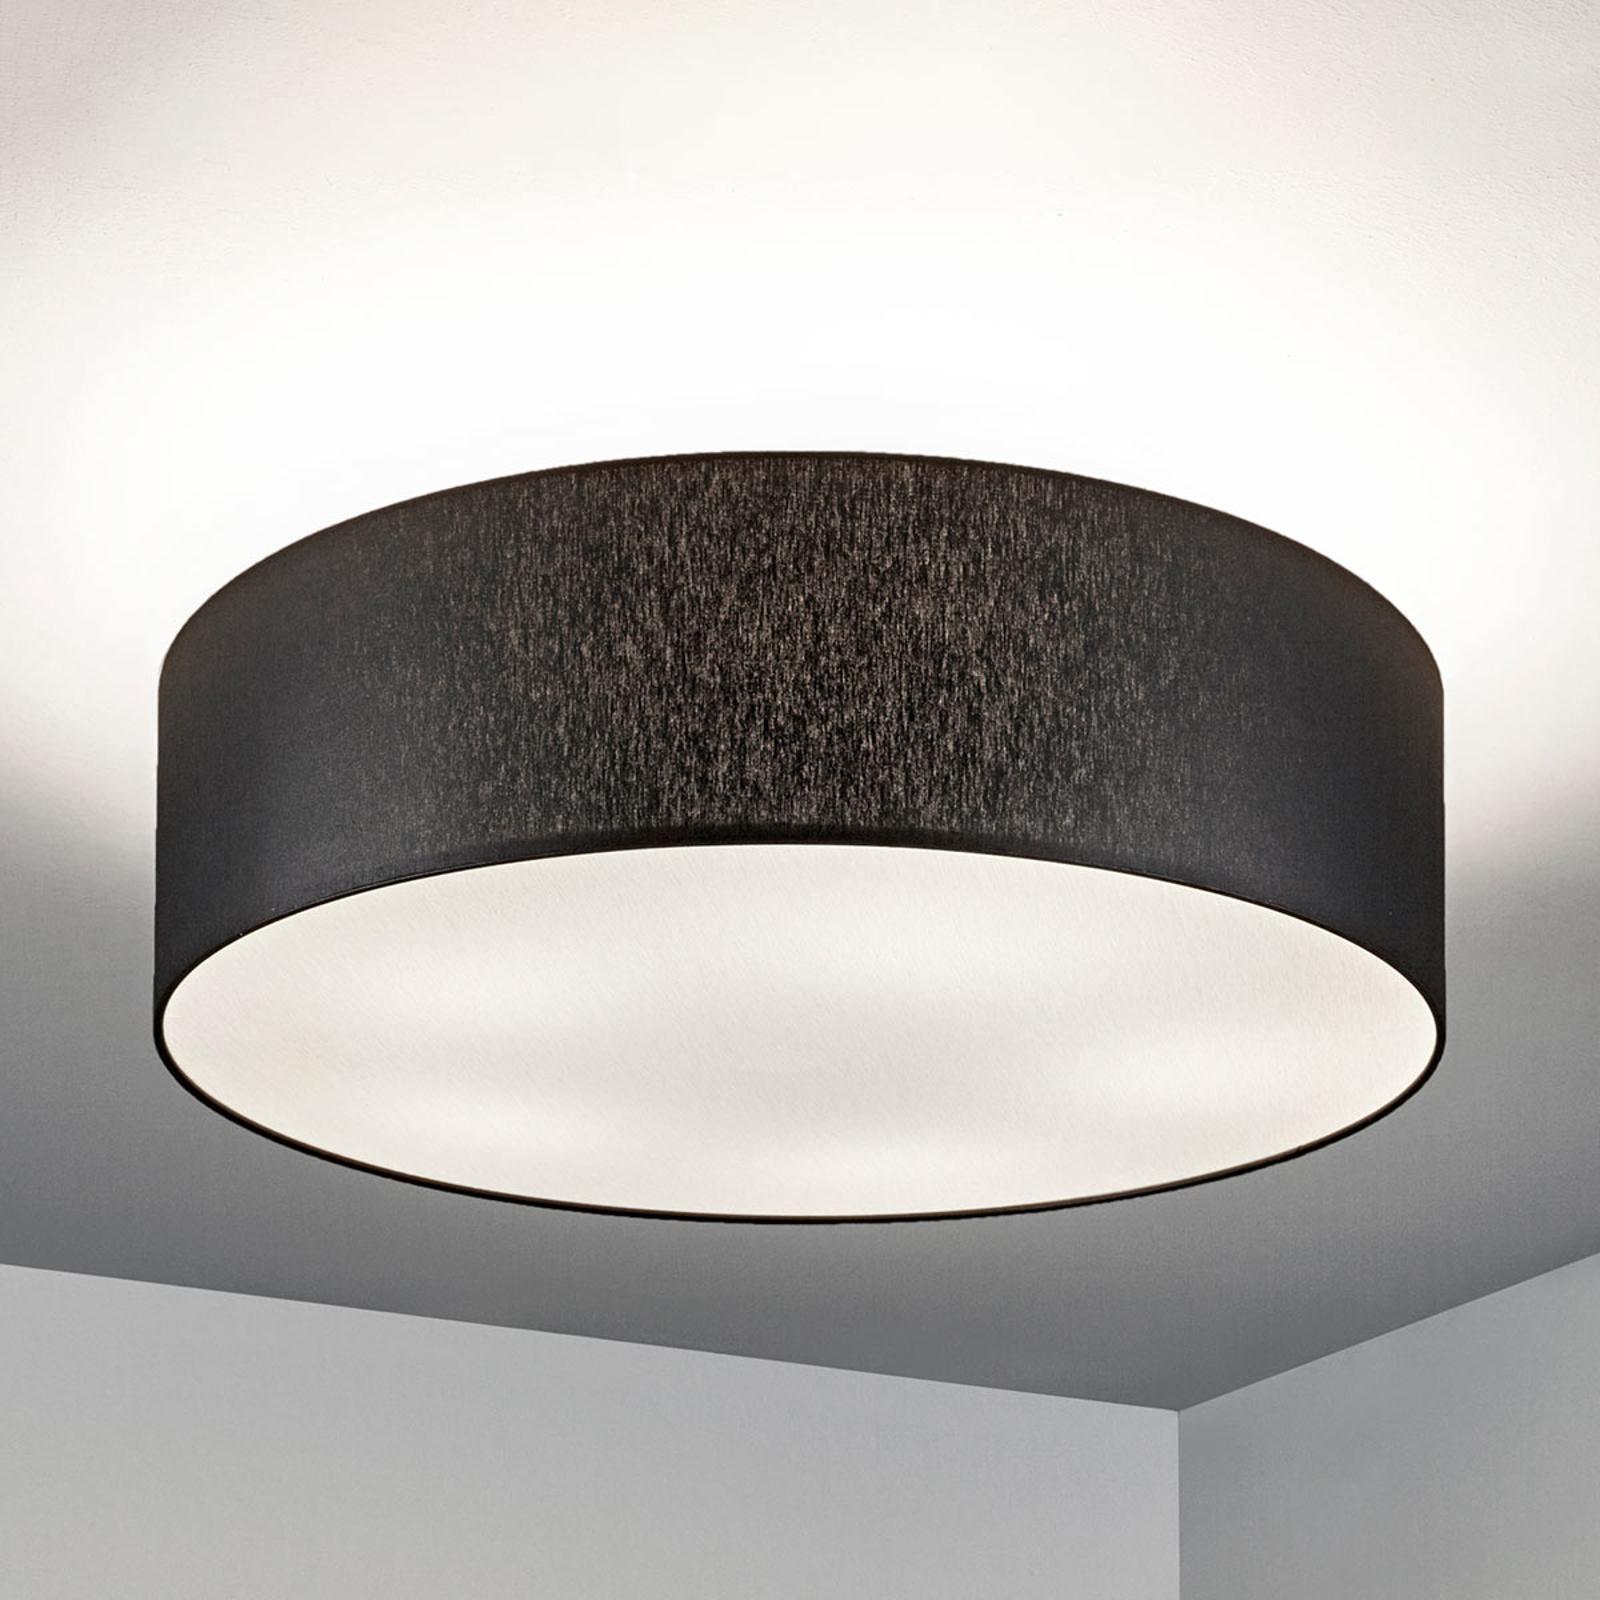 Taklampe Gala, 60 cm, chintz svart